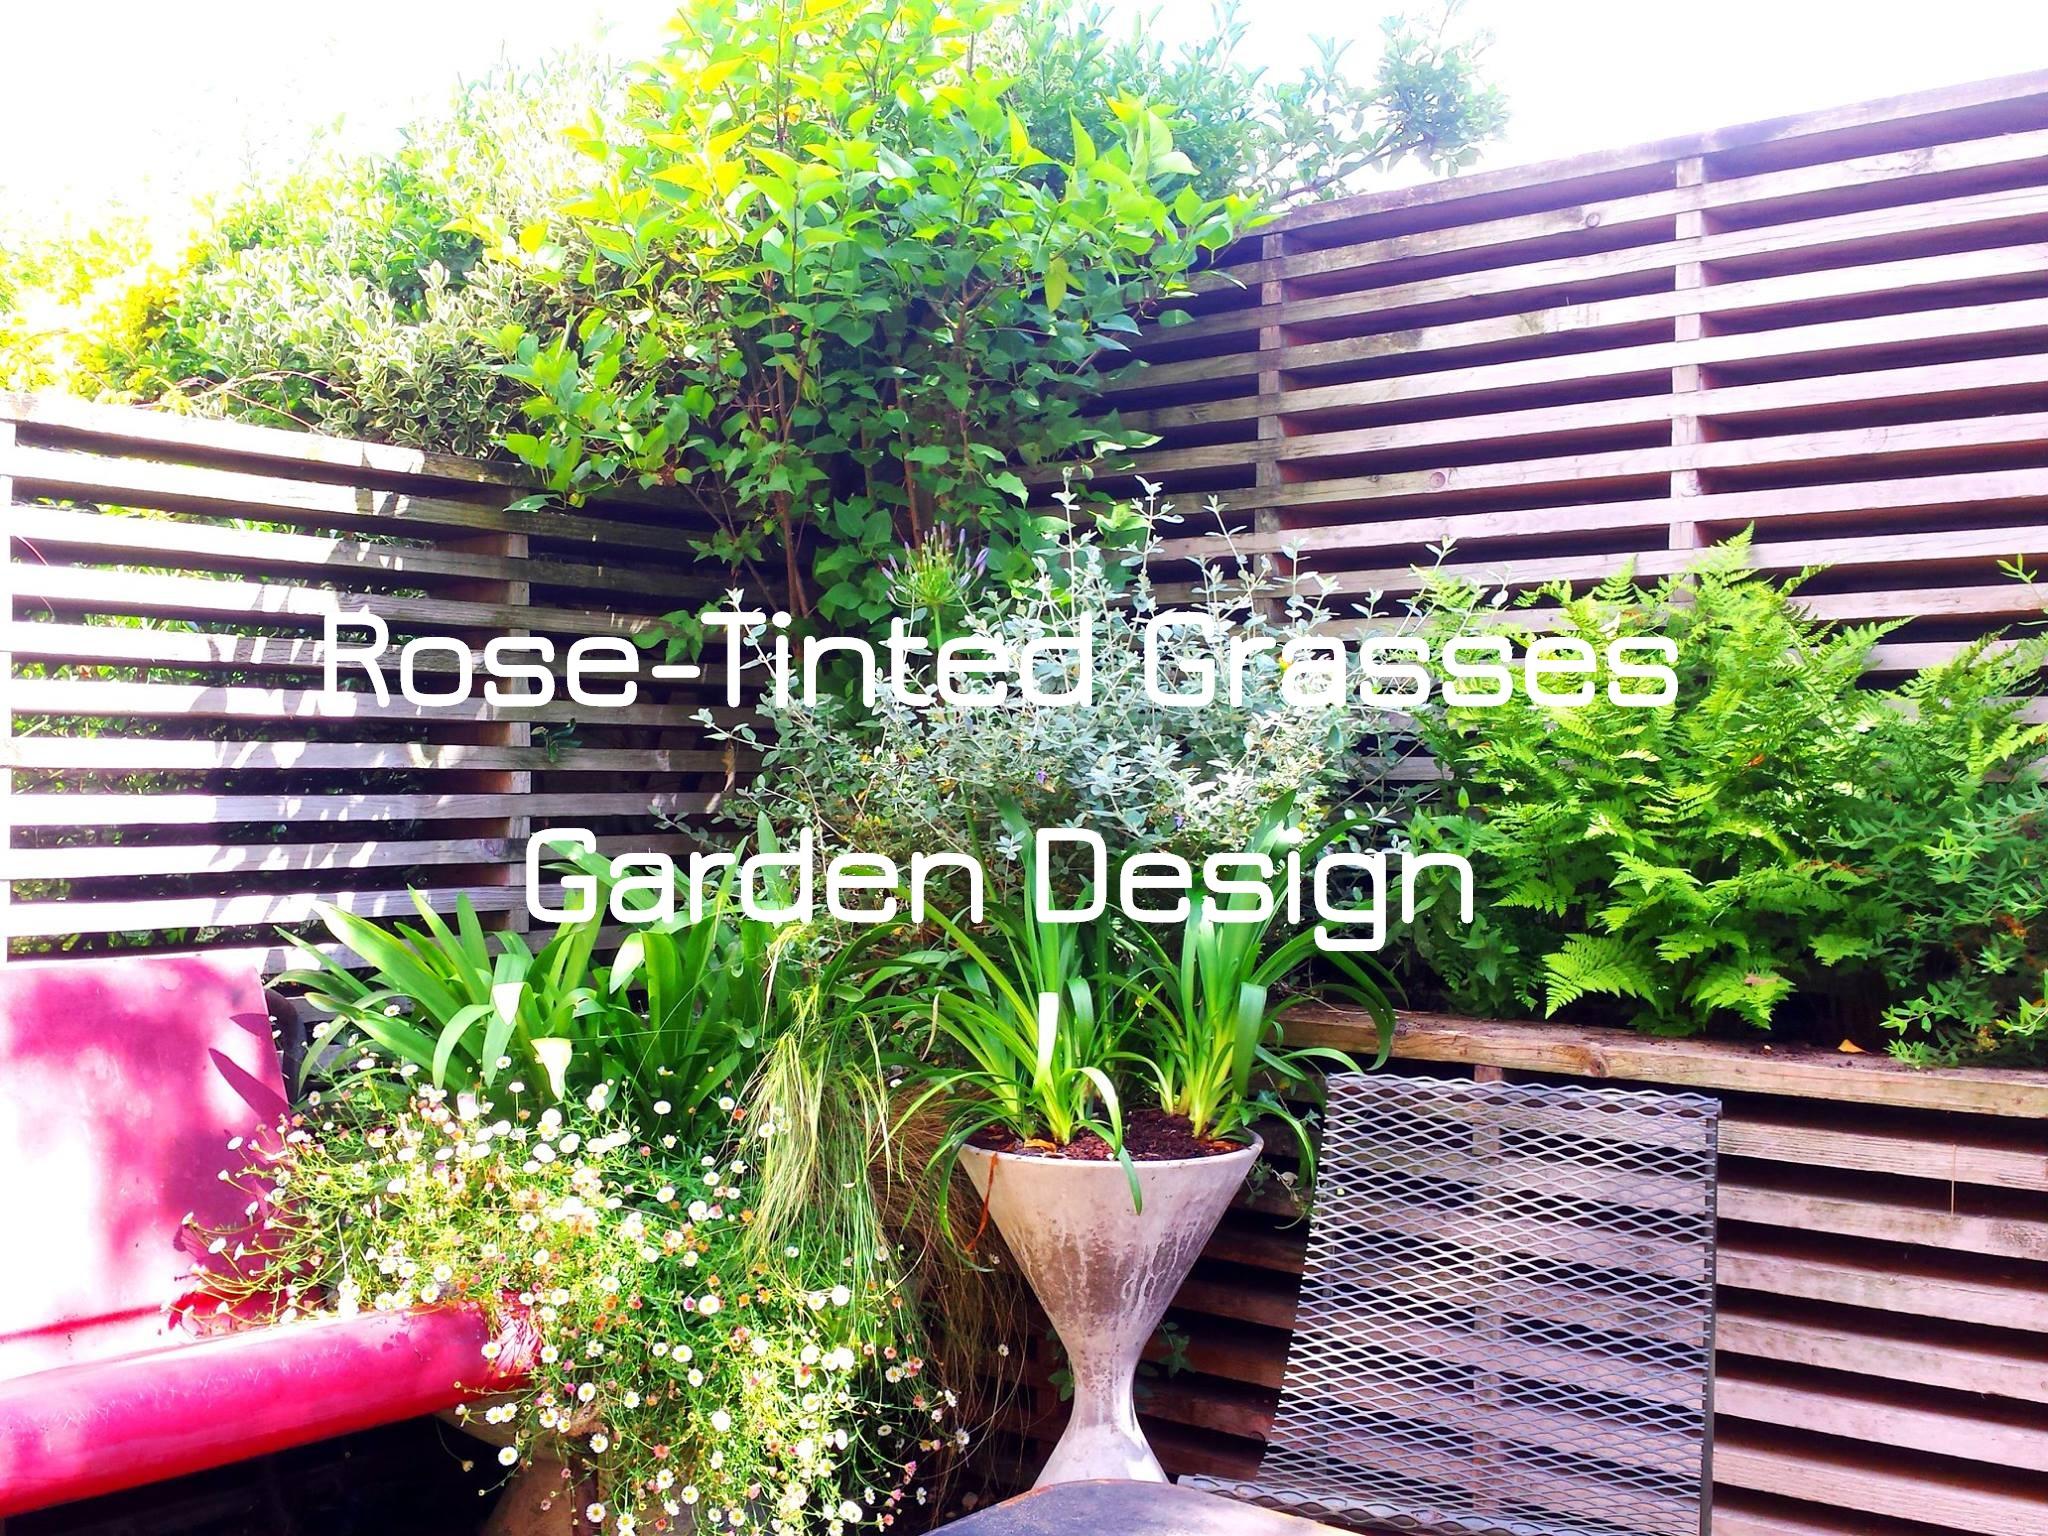 Saul Abbott Garden Design